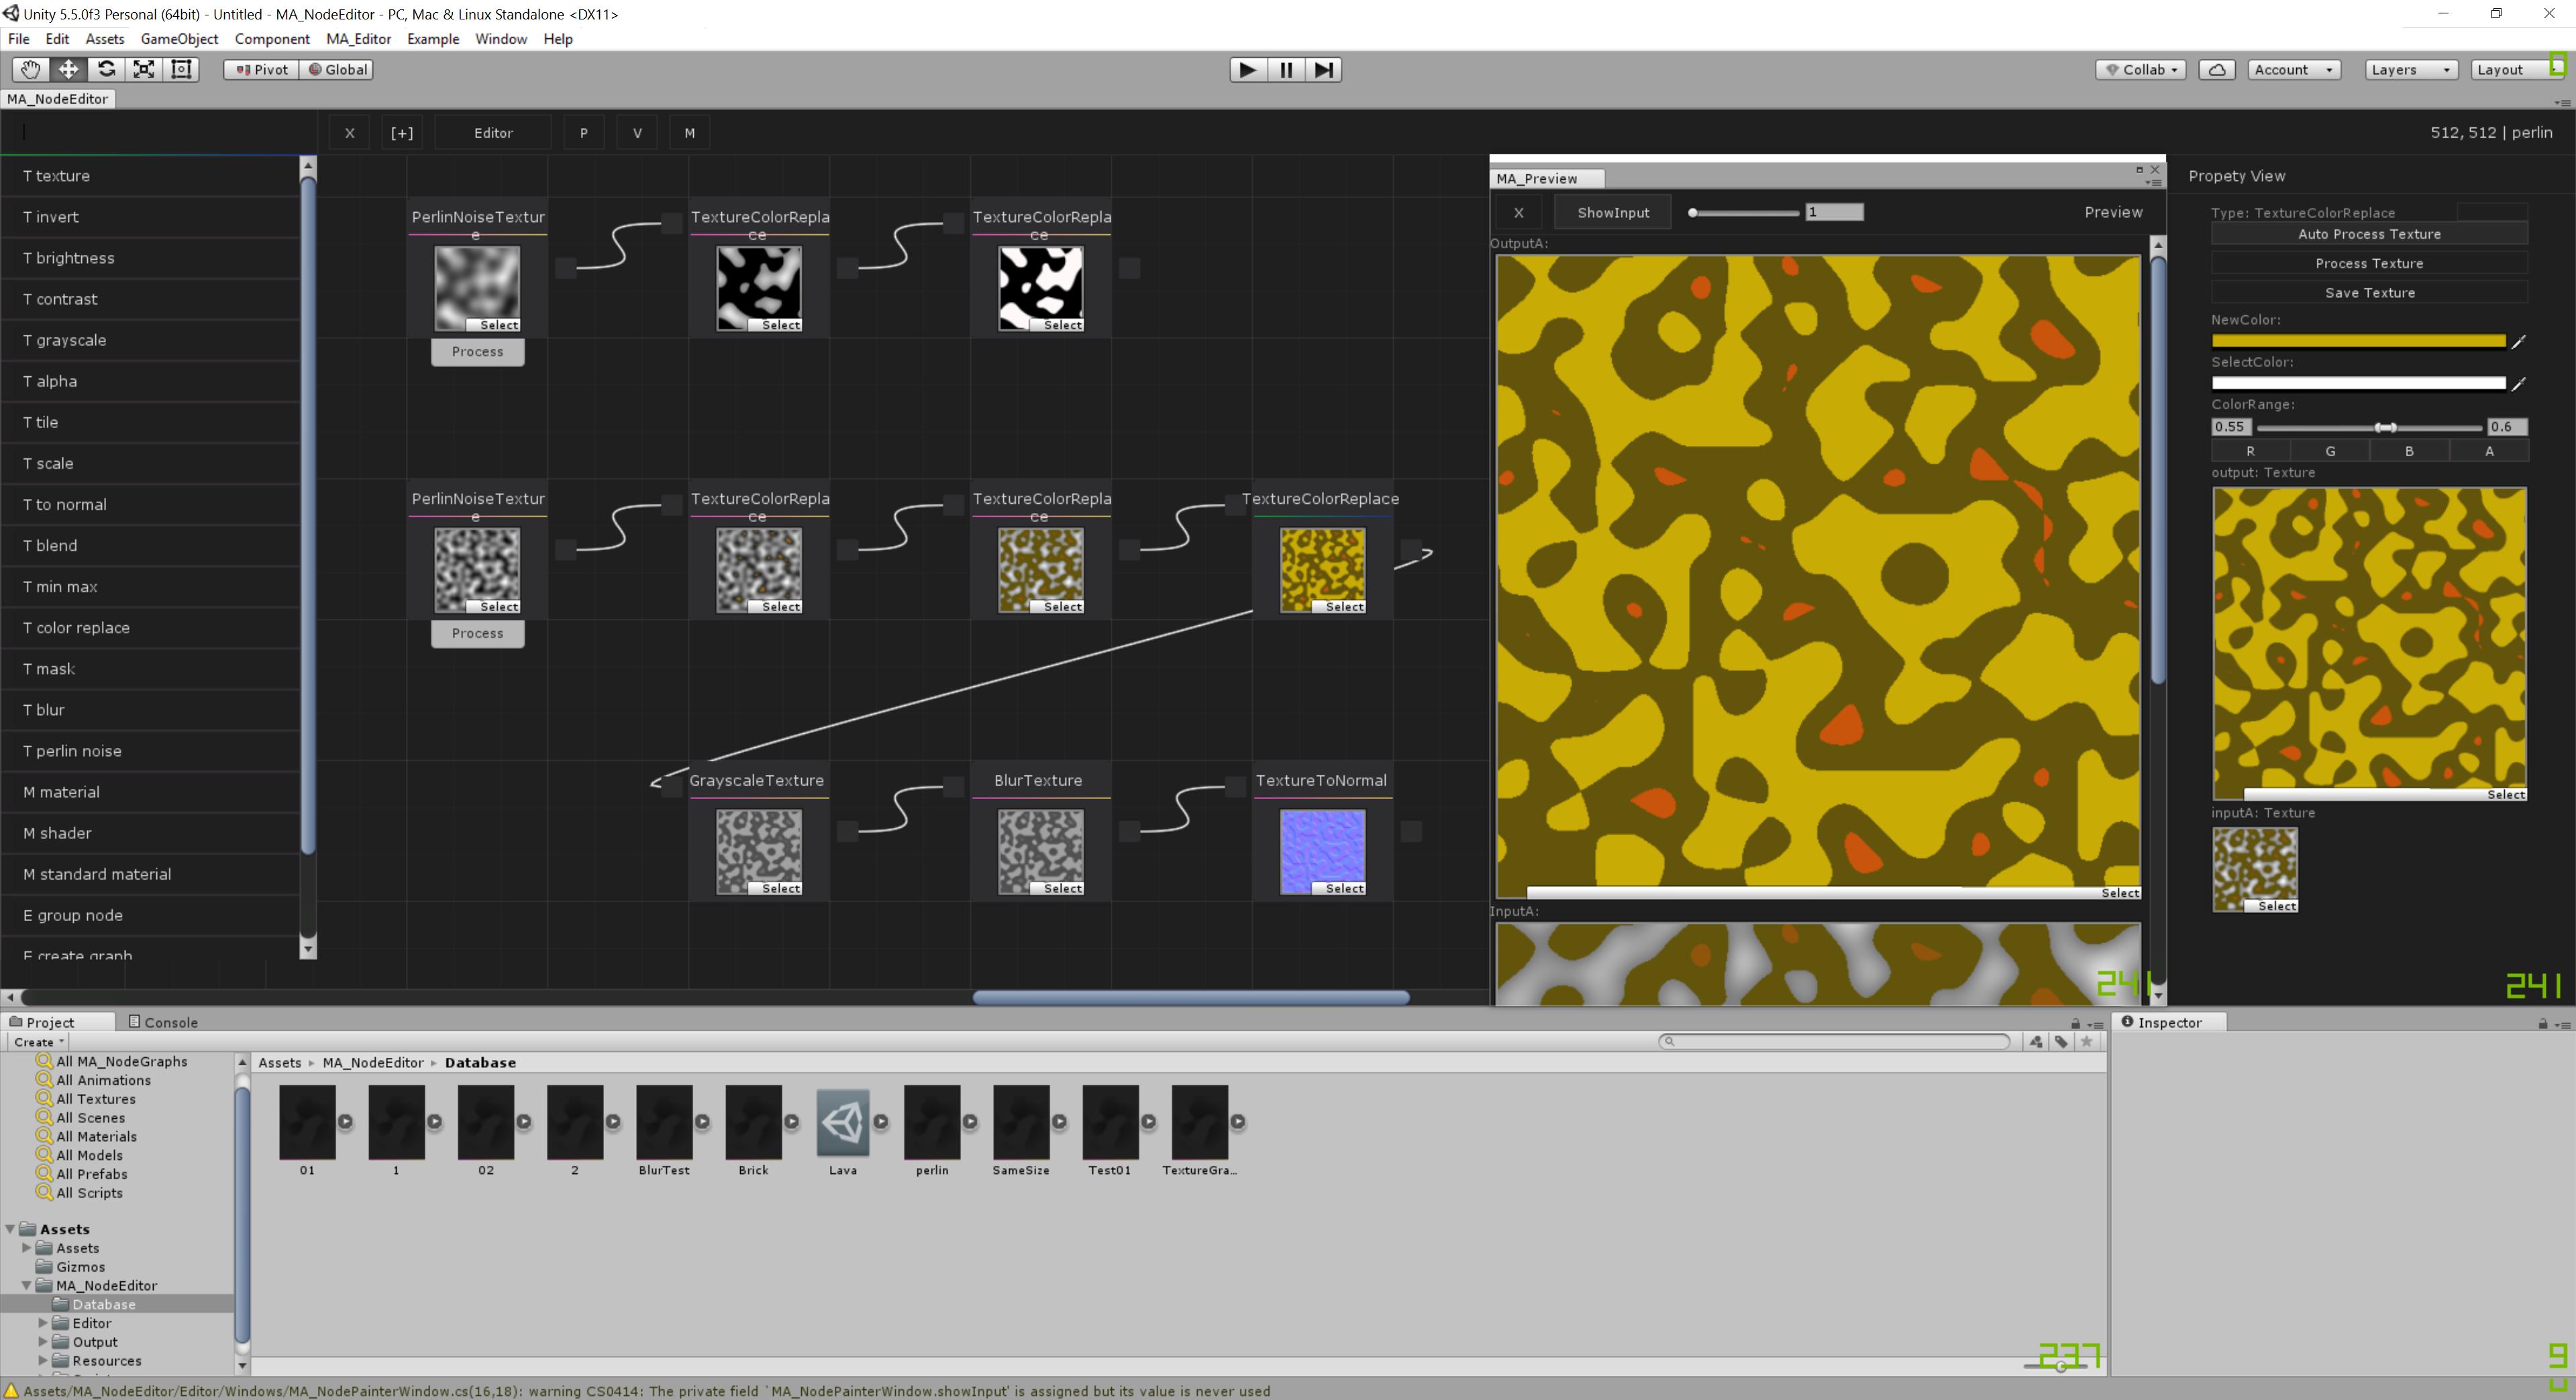 MA_NodeEditor Unity Editor Extension, Image Editor